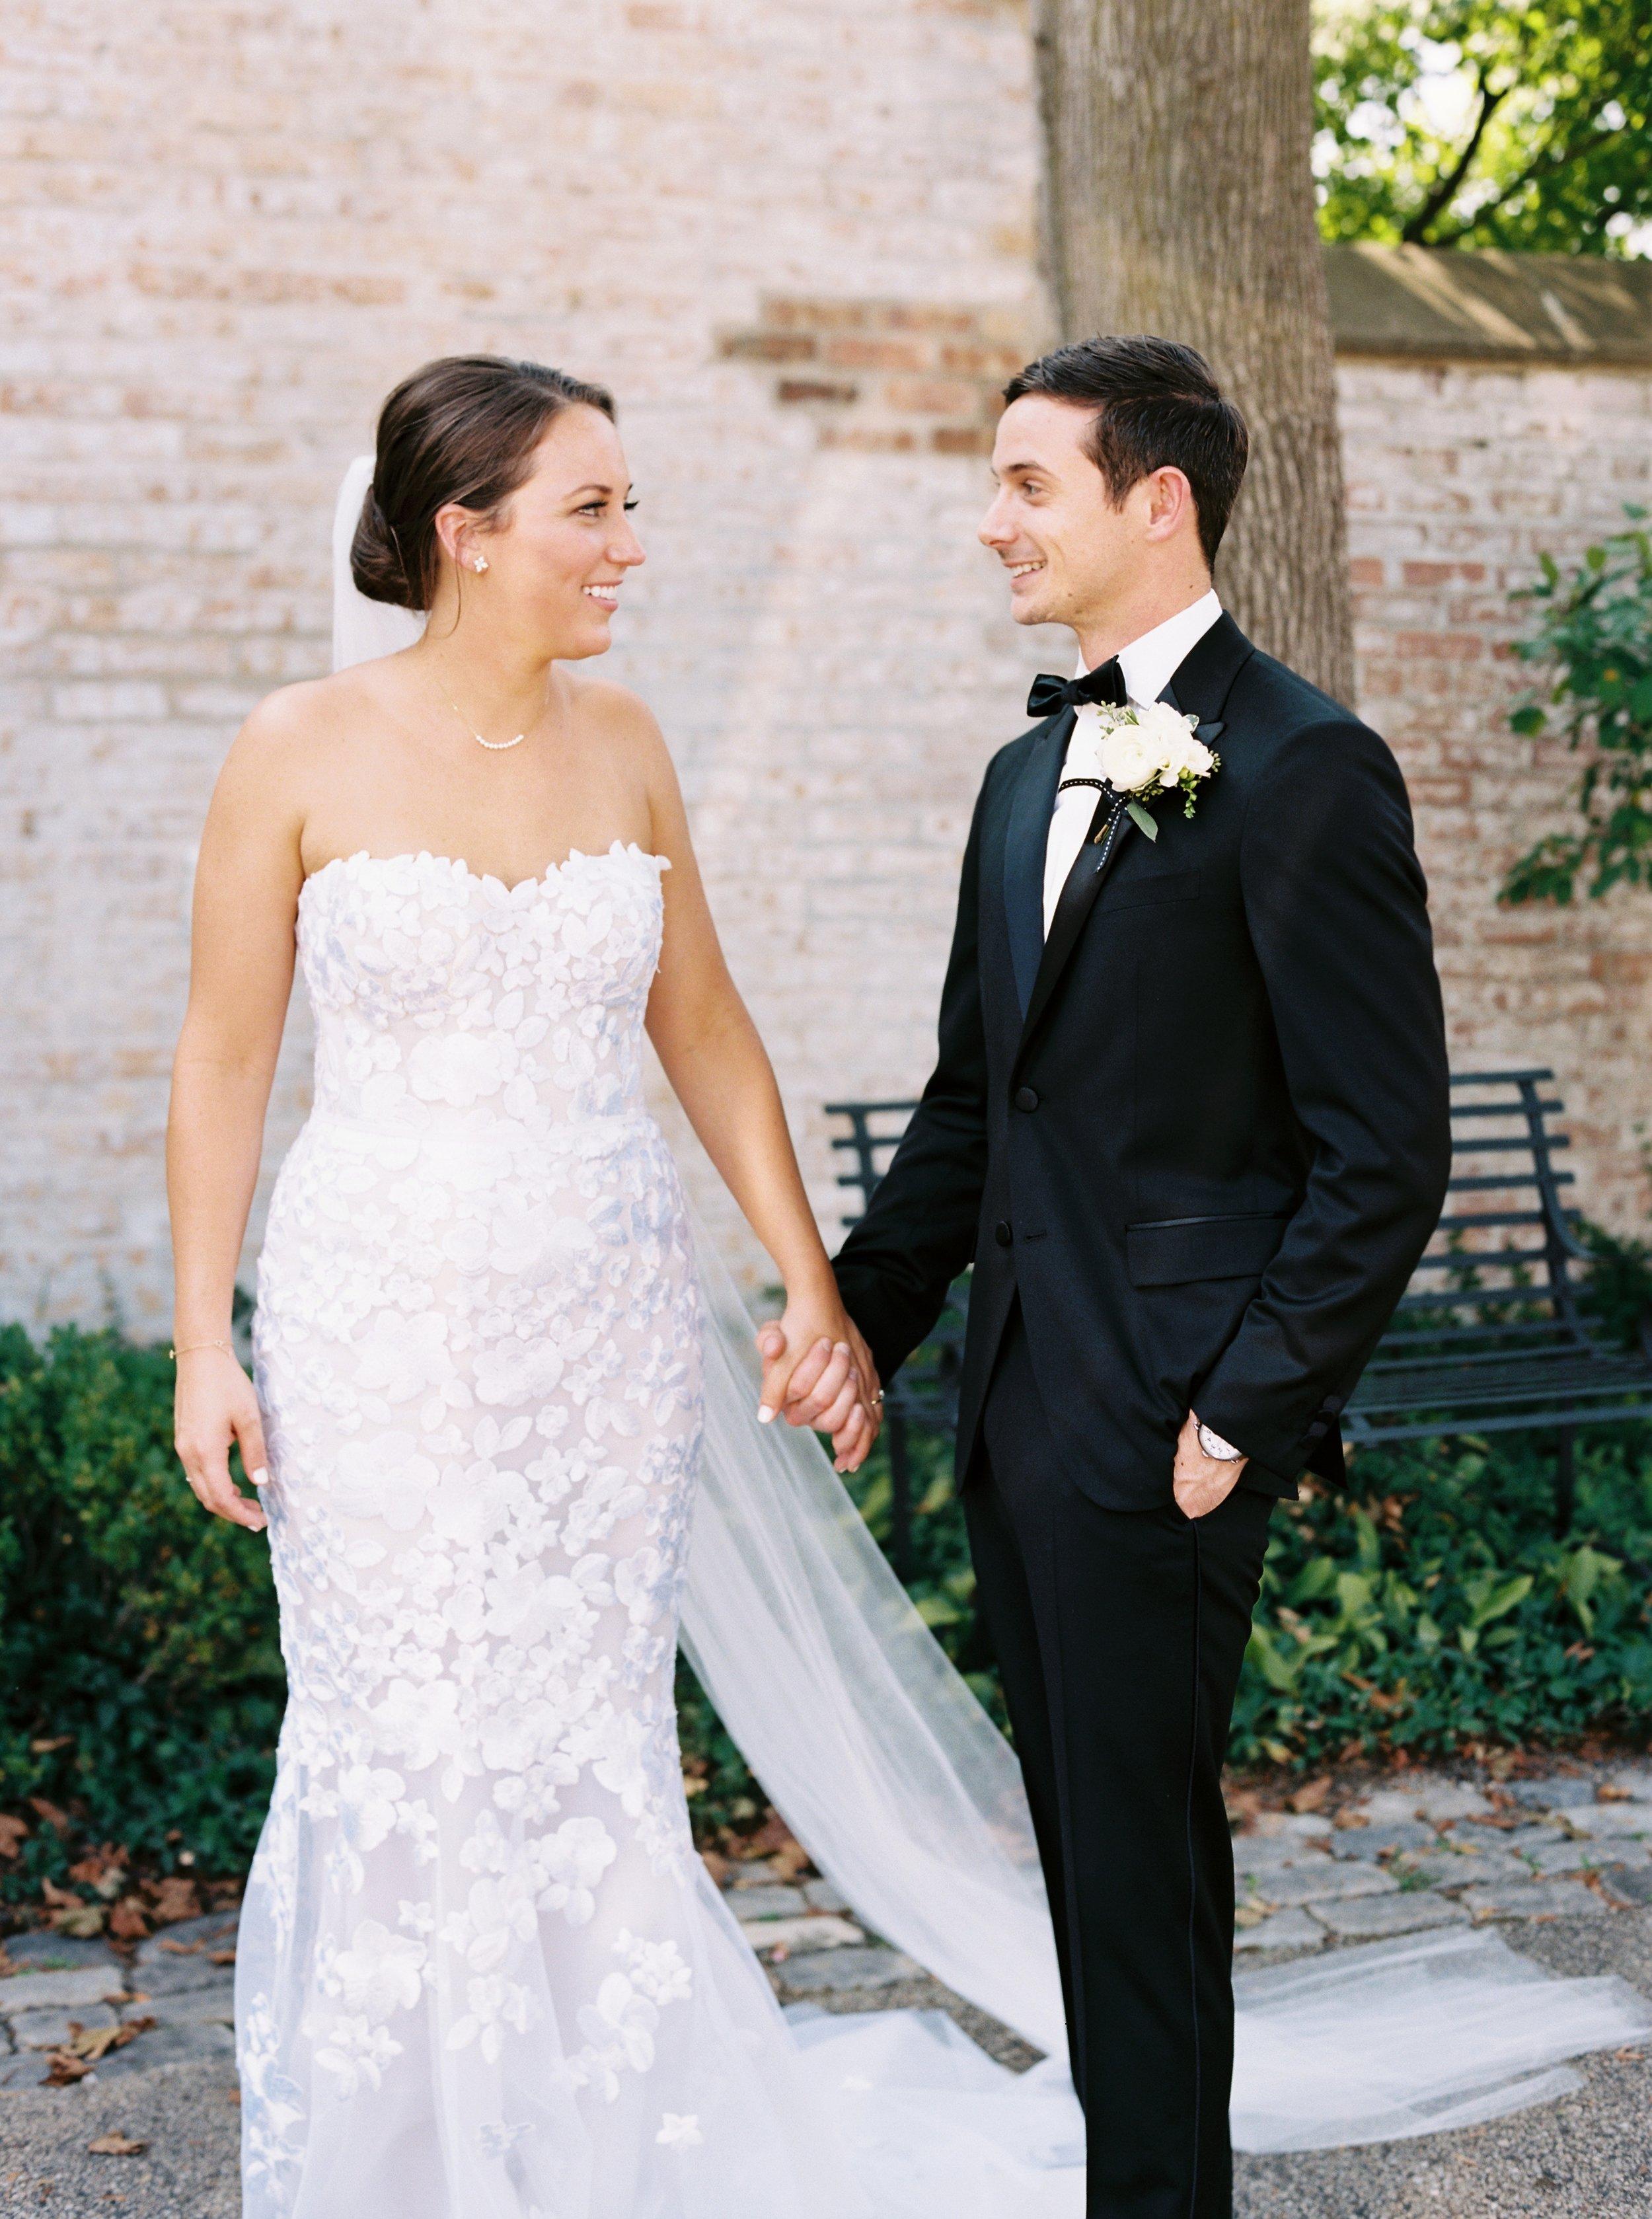 Kyle John l Fine Art Wedding Photography l Chicago, Copenhagen, California, New York, Destination l Blog l Kate and Michael_Winnetka_13